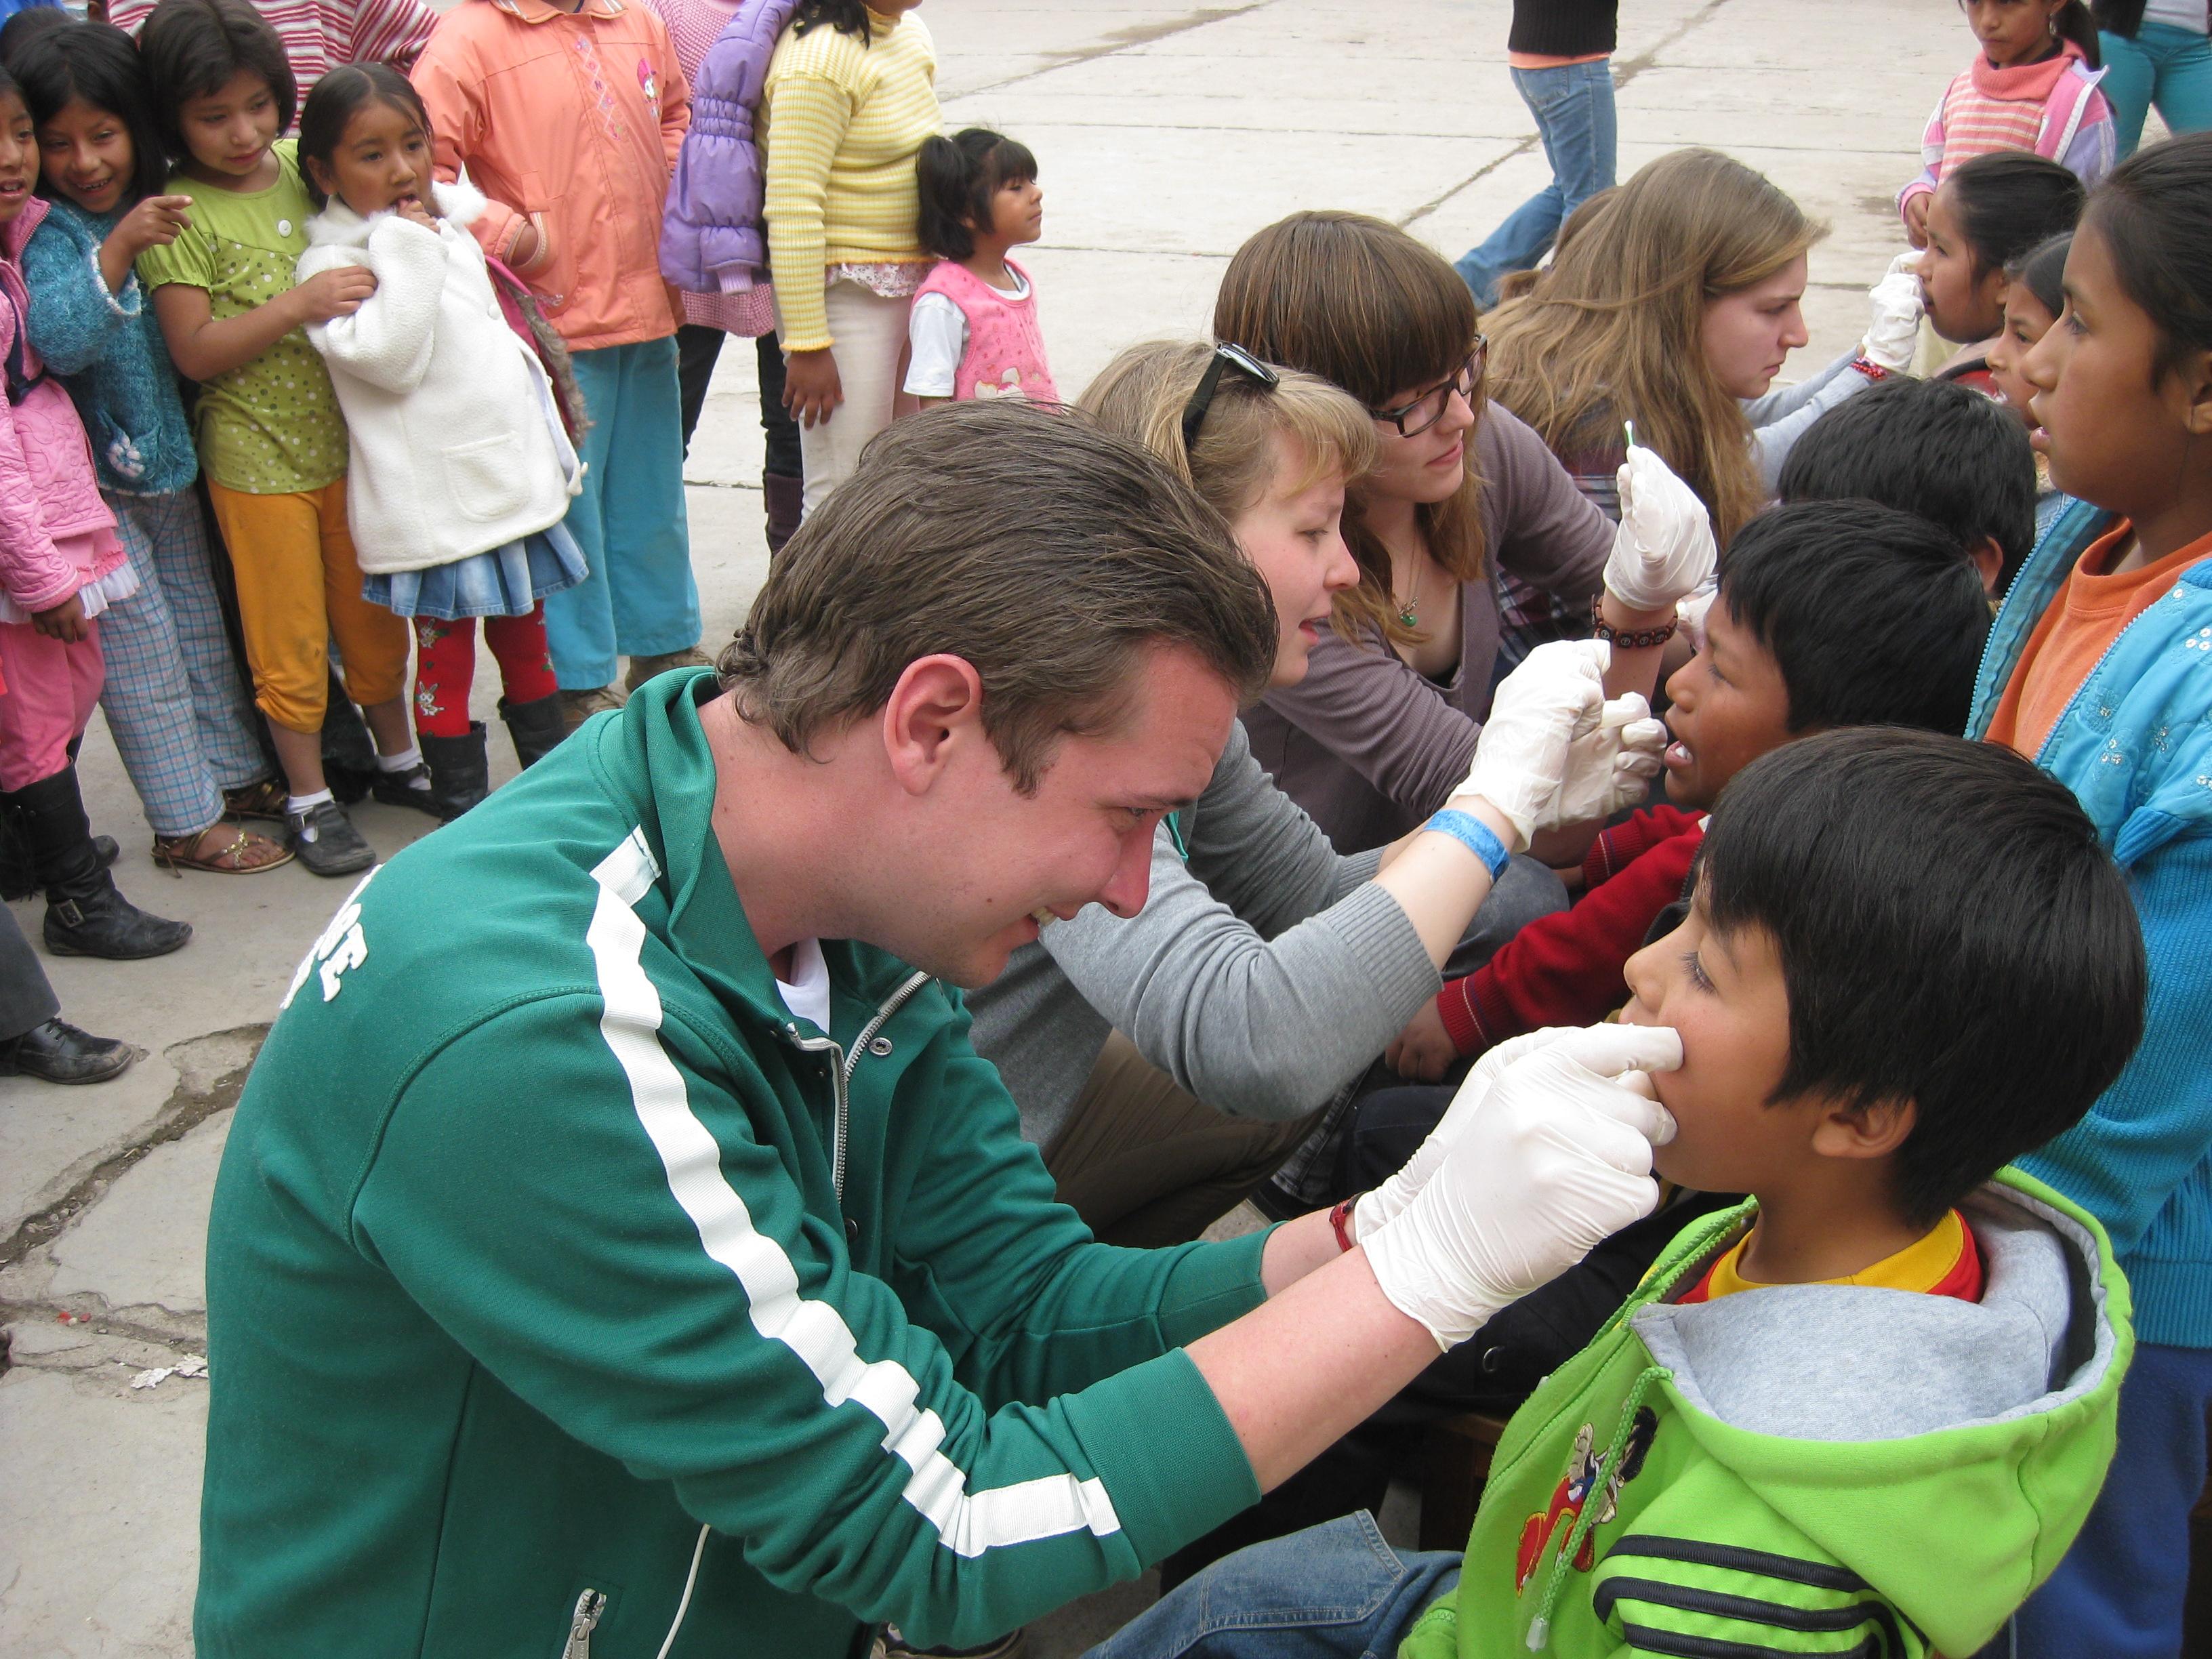 Gap Year Program - Projects Abroad: Gap Year Volunteering Abroad  6